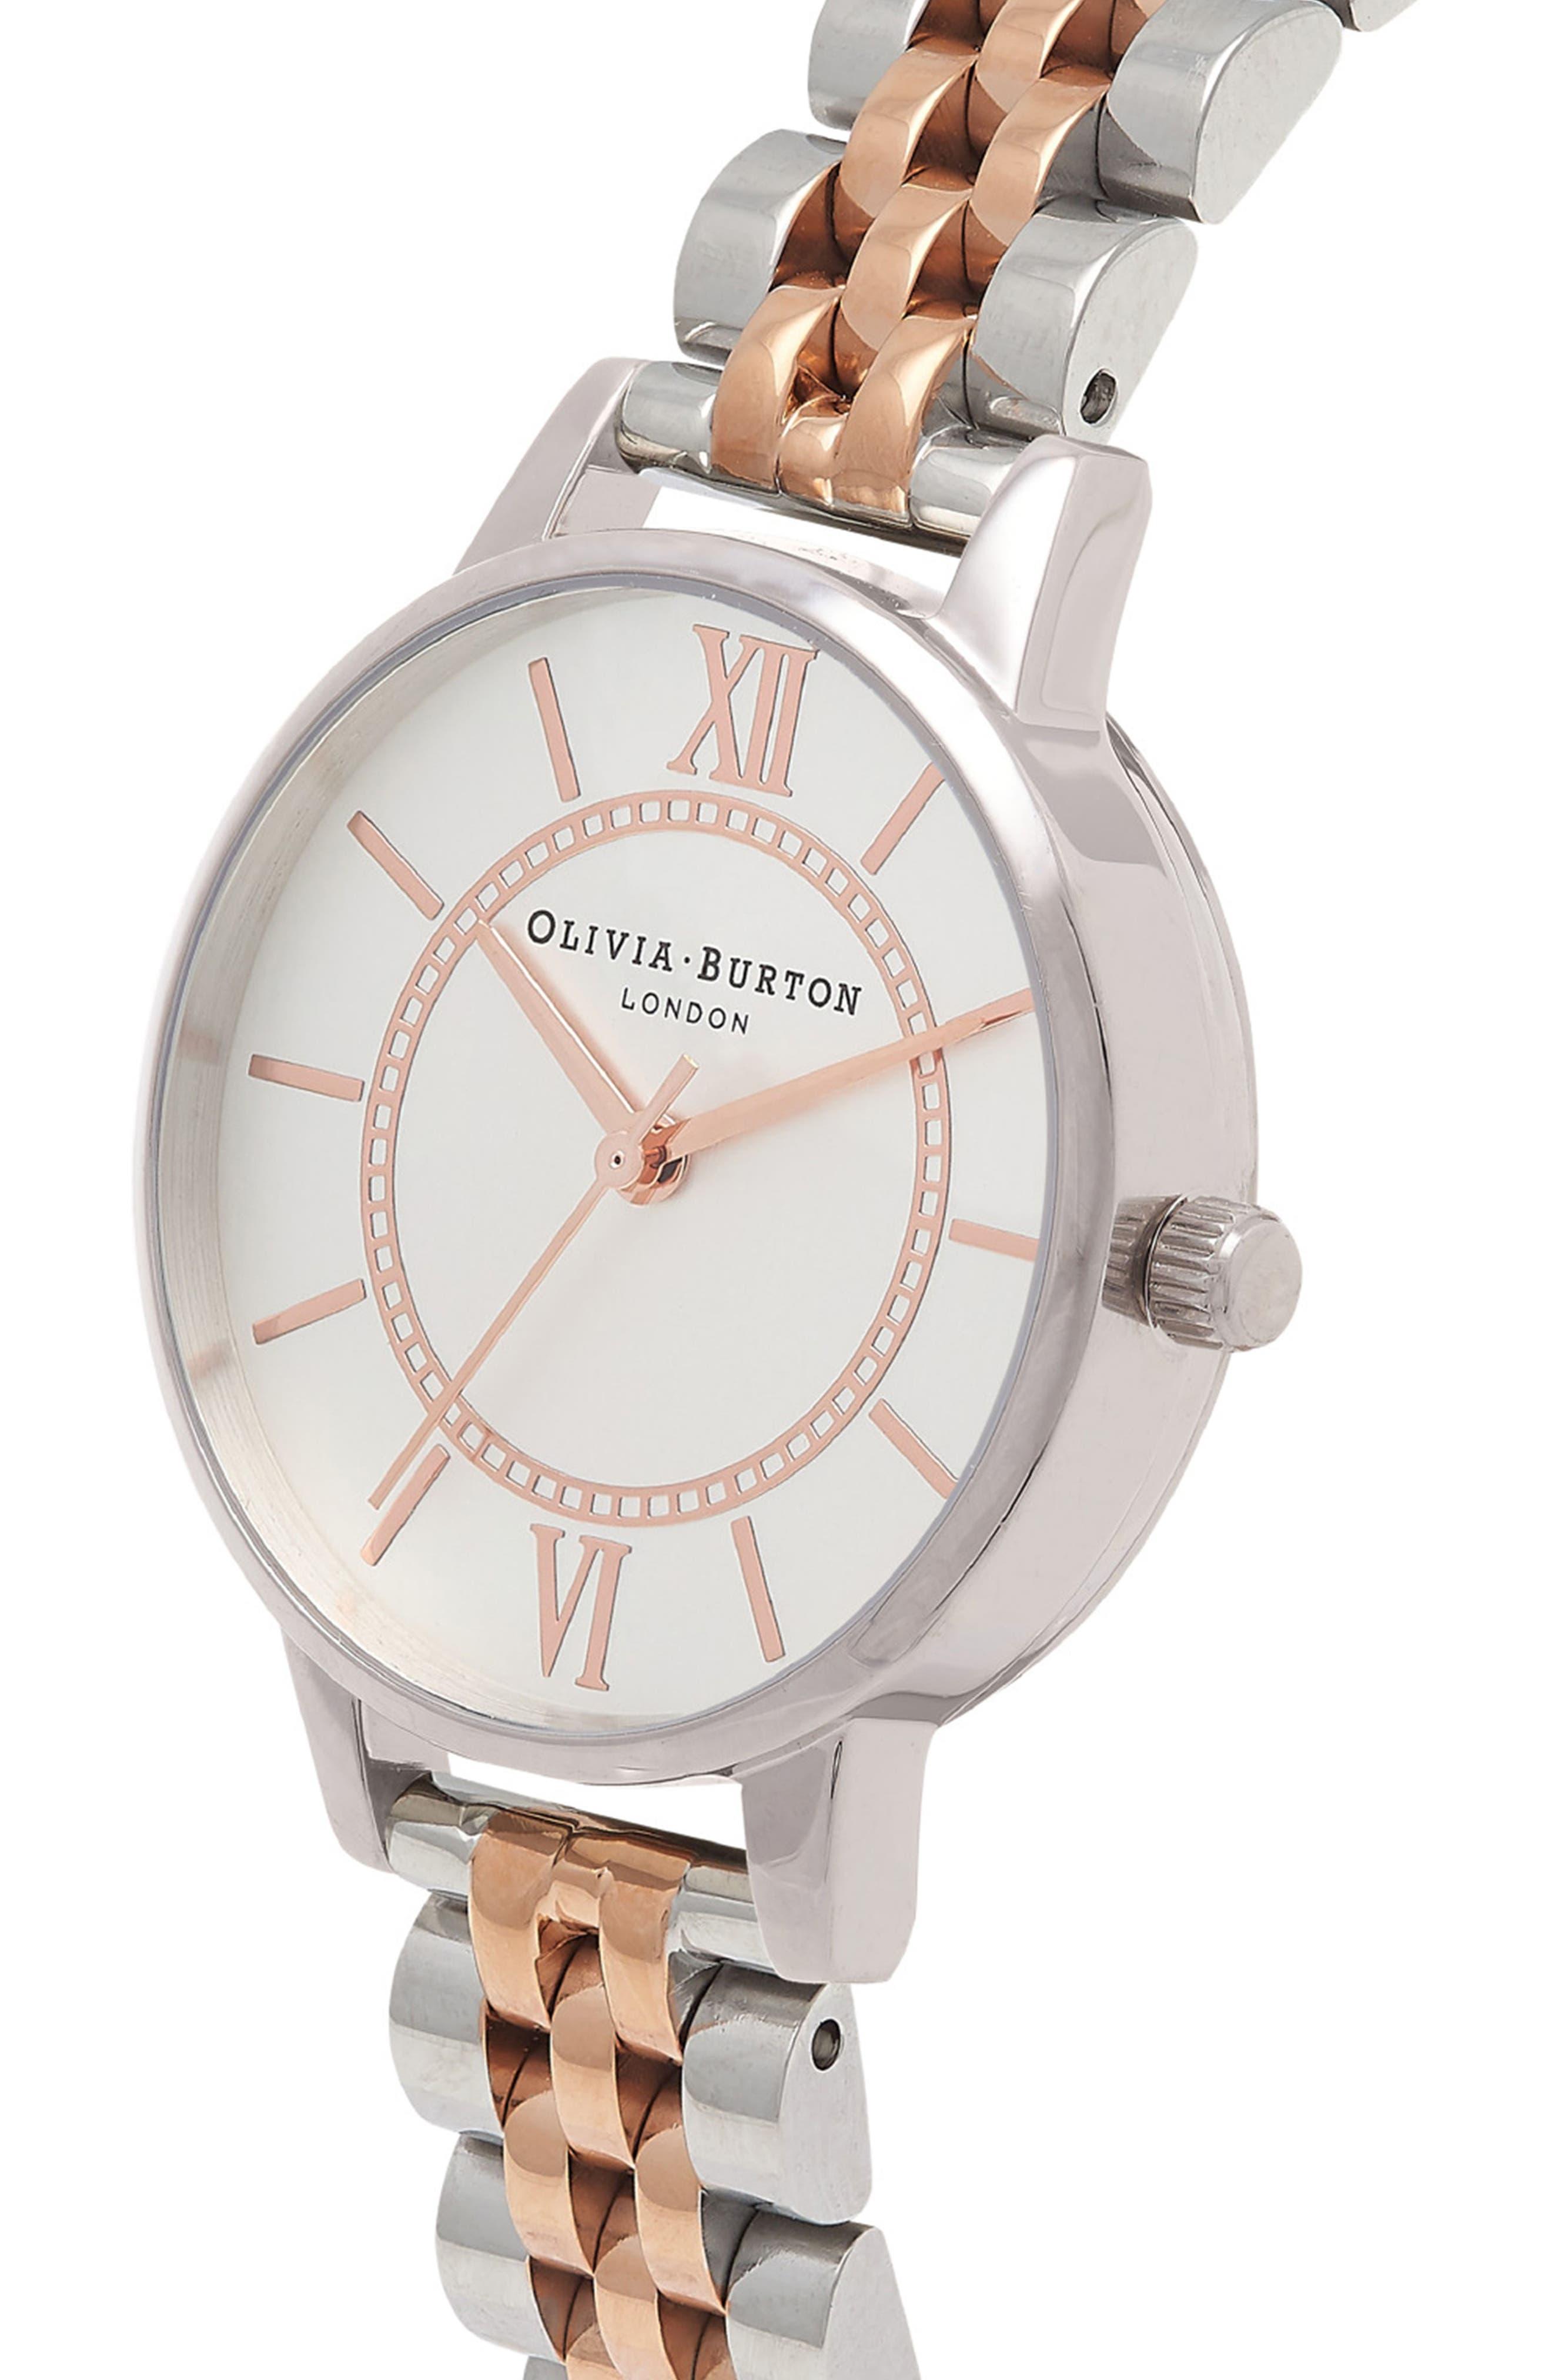 OLIVIA BURTON, Wonderland Bracelet Watch, 30mm, Alternate thumbnail 4, color, ROSE GOLD/ SILVER